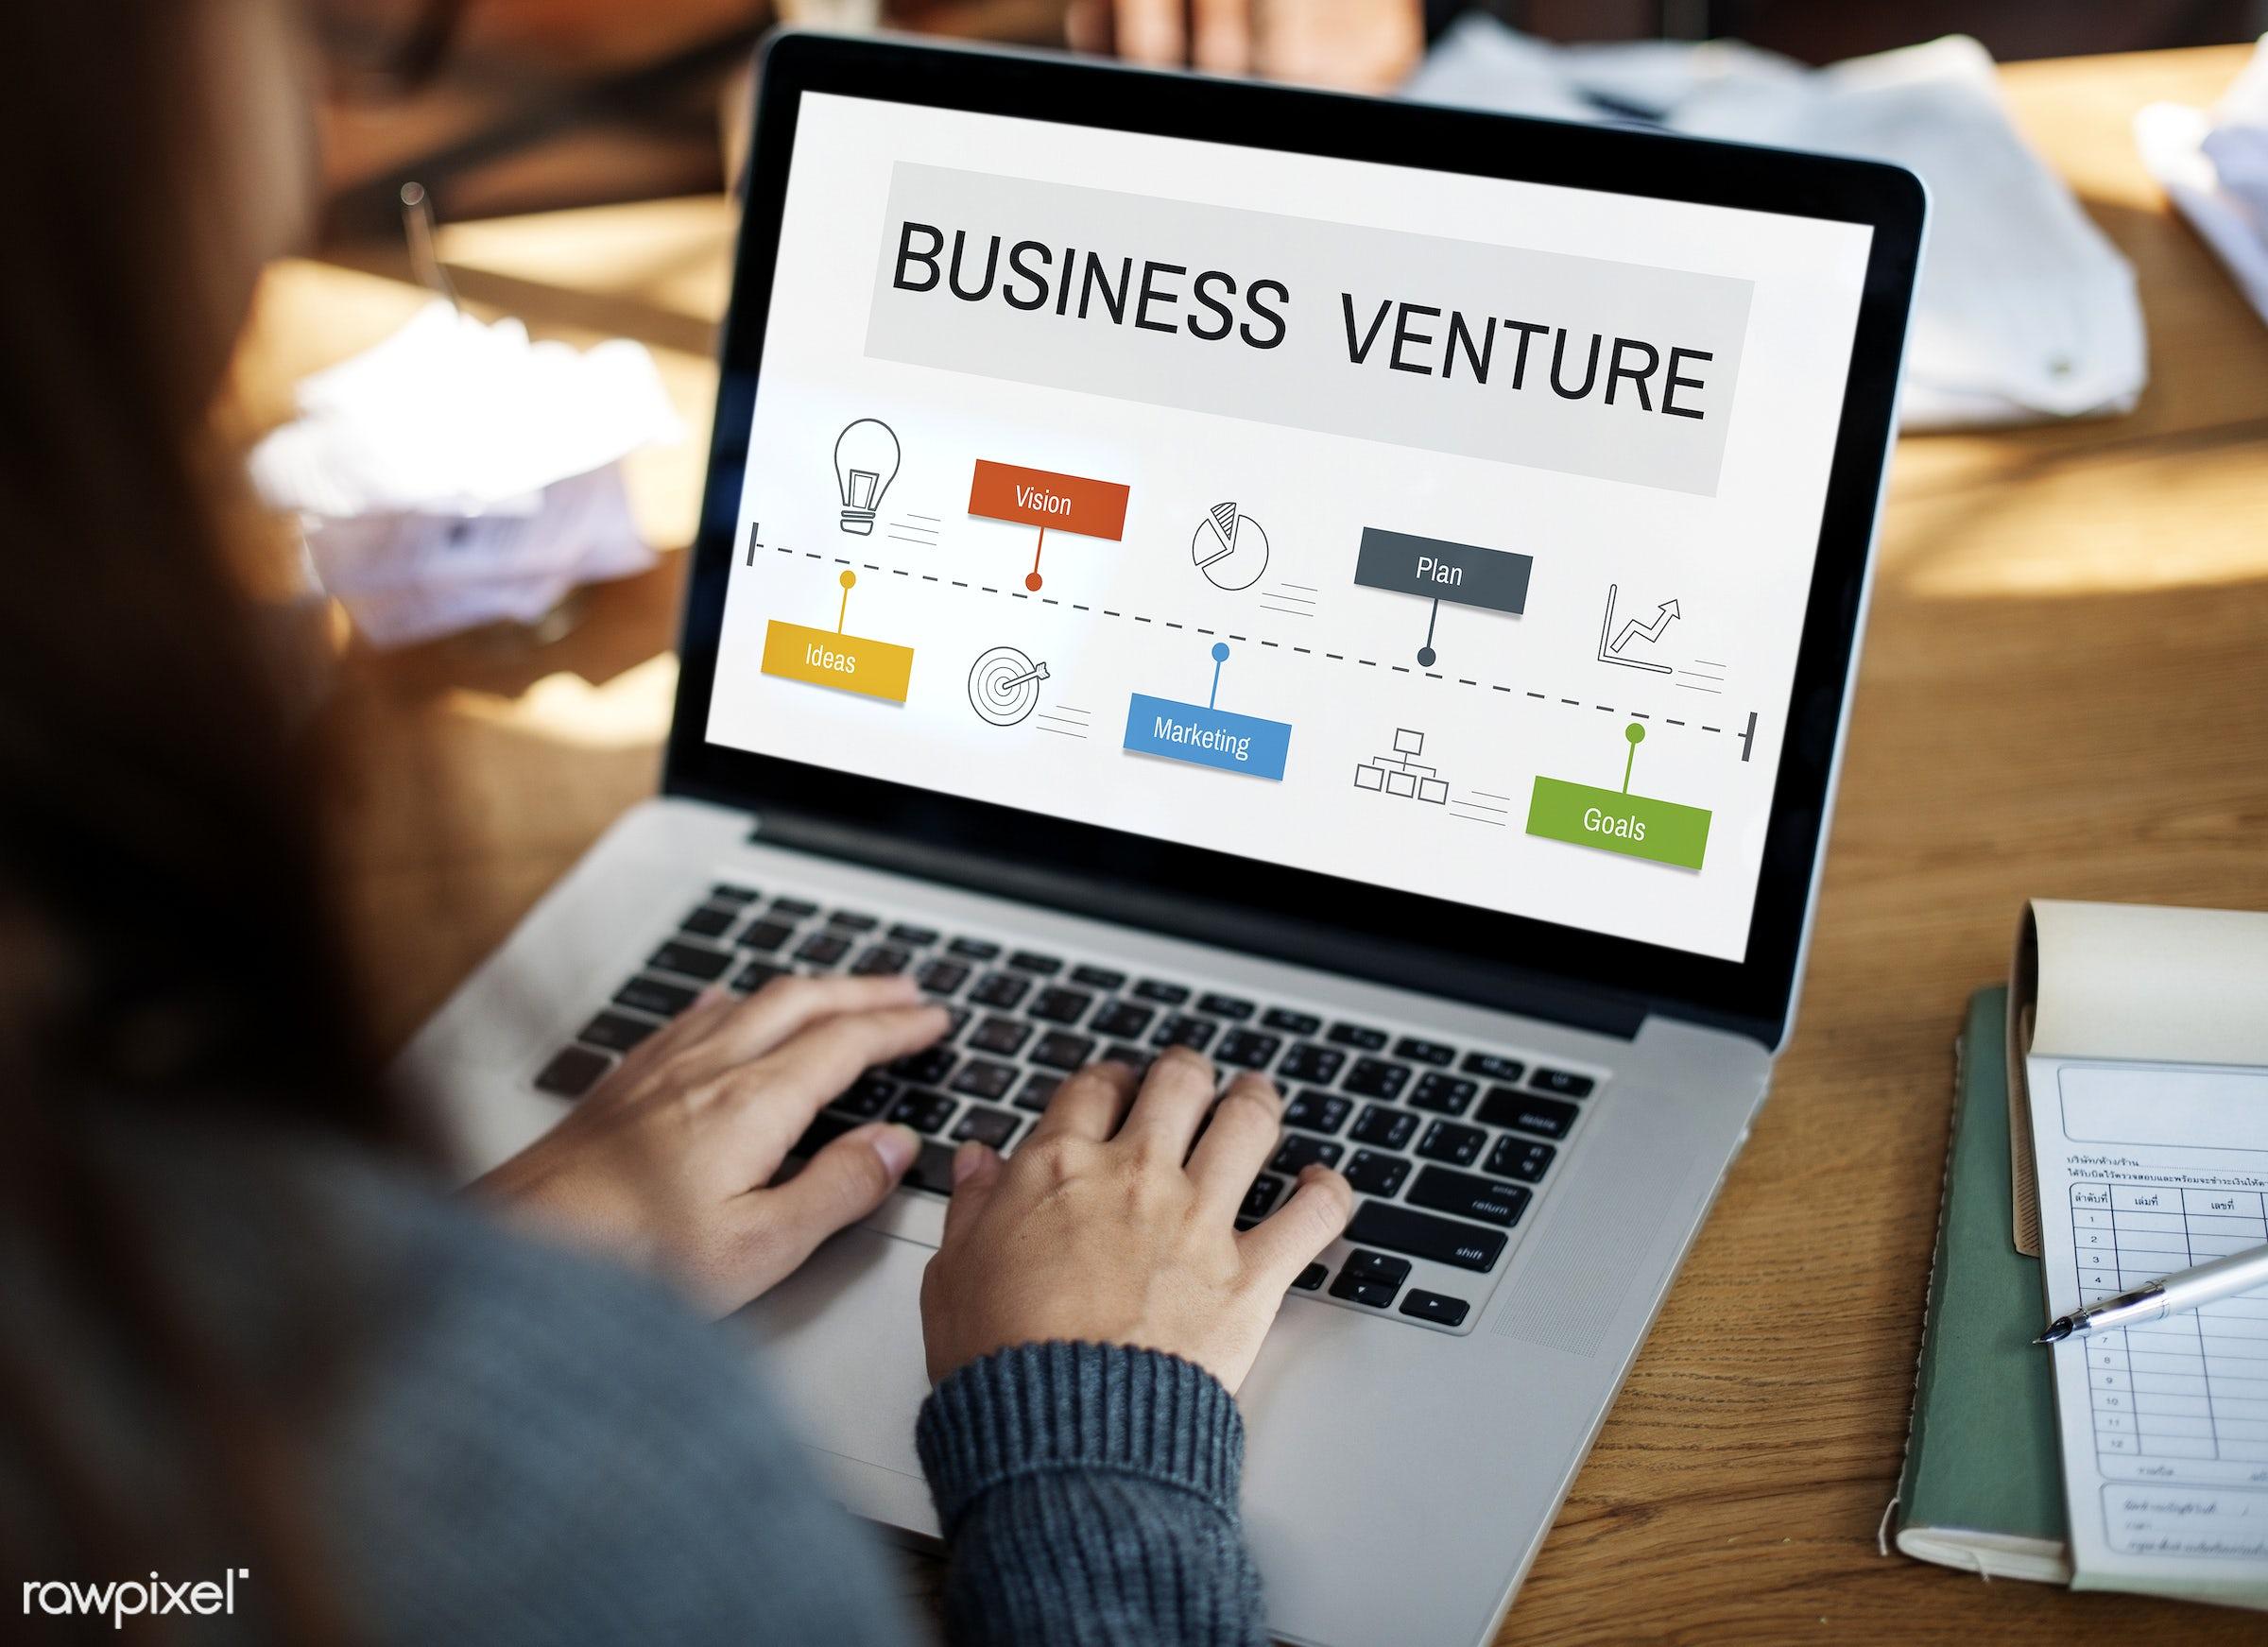 brainstorm, browsing, business, creativity, development, device, digital, digital device, enterprise, entrepreneur,...